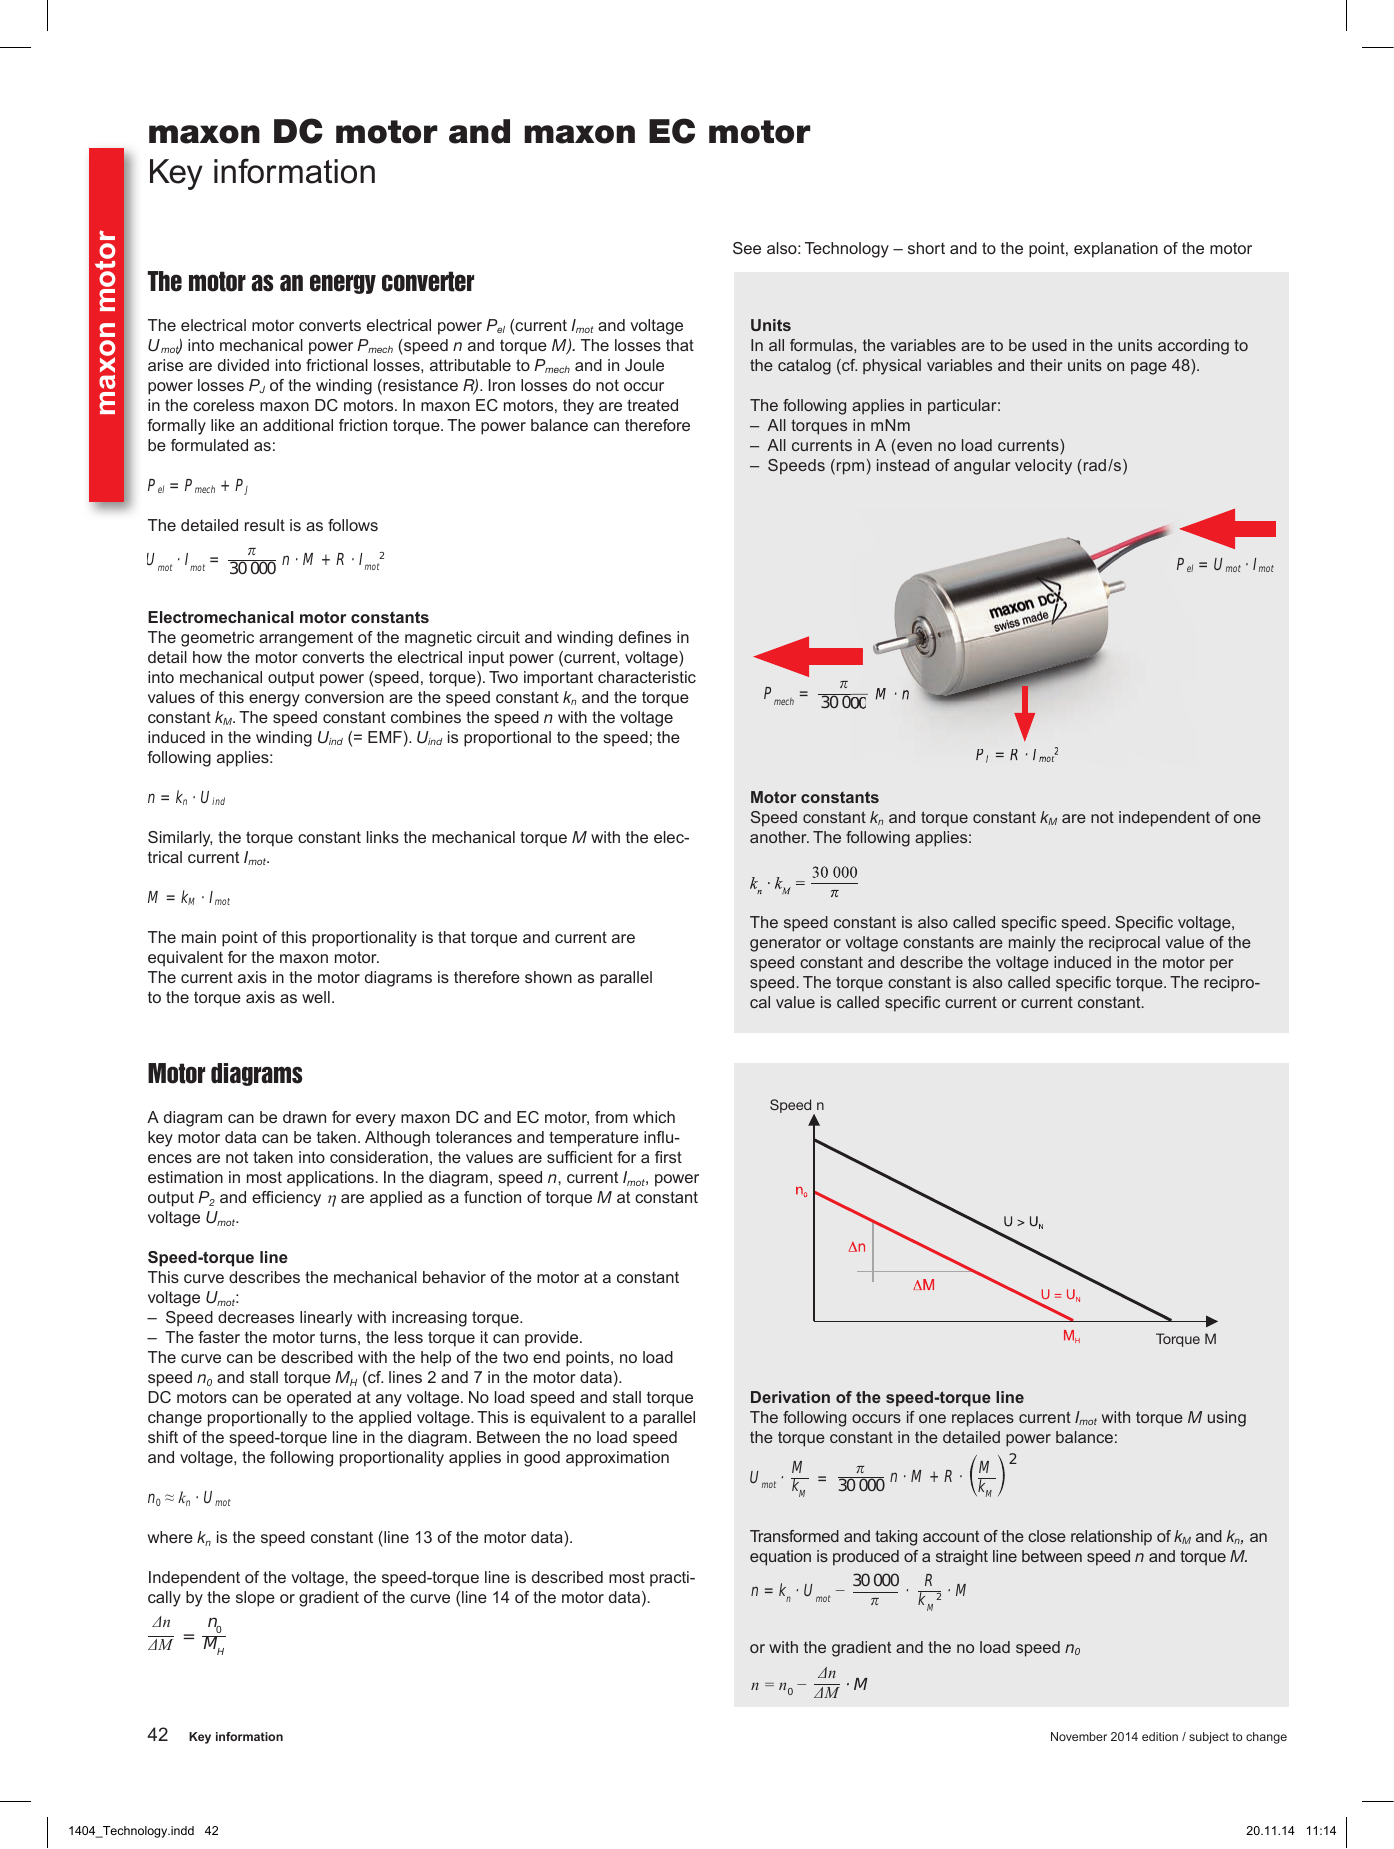 Maxon Dc Motor And Ec Key Information Wire Diagram 018073920 1 8990ffb9299863ed6232b4614211b7e2